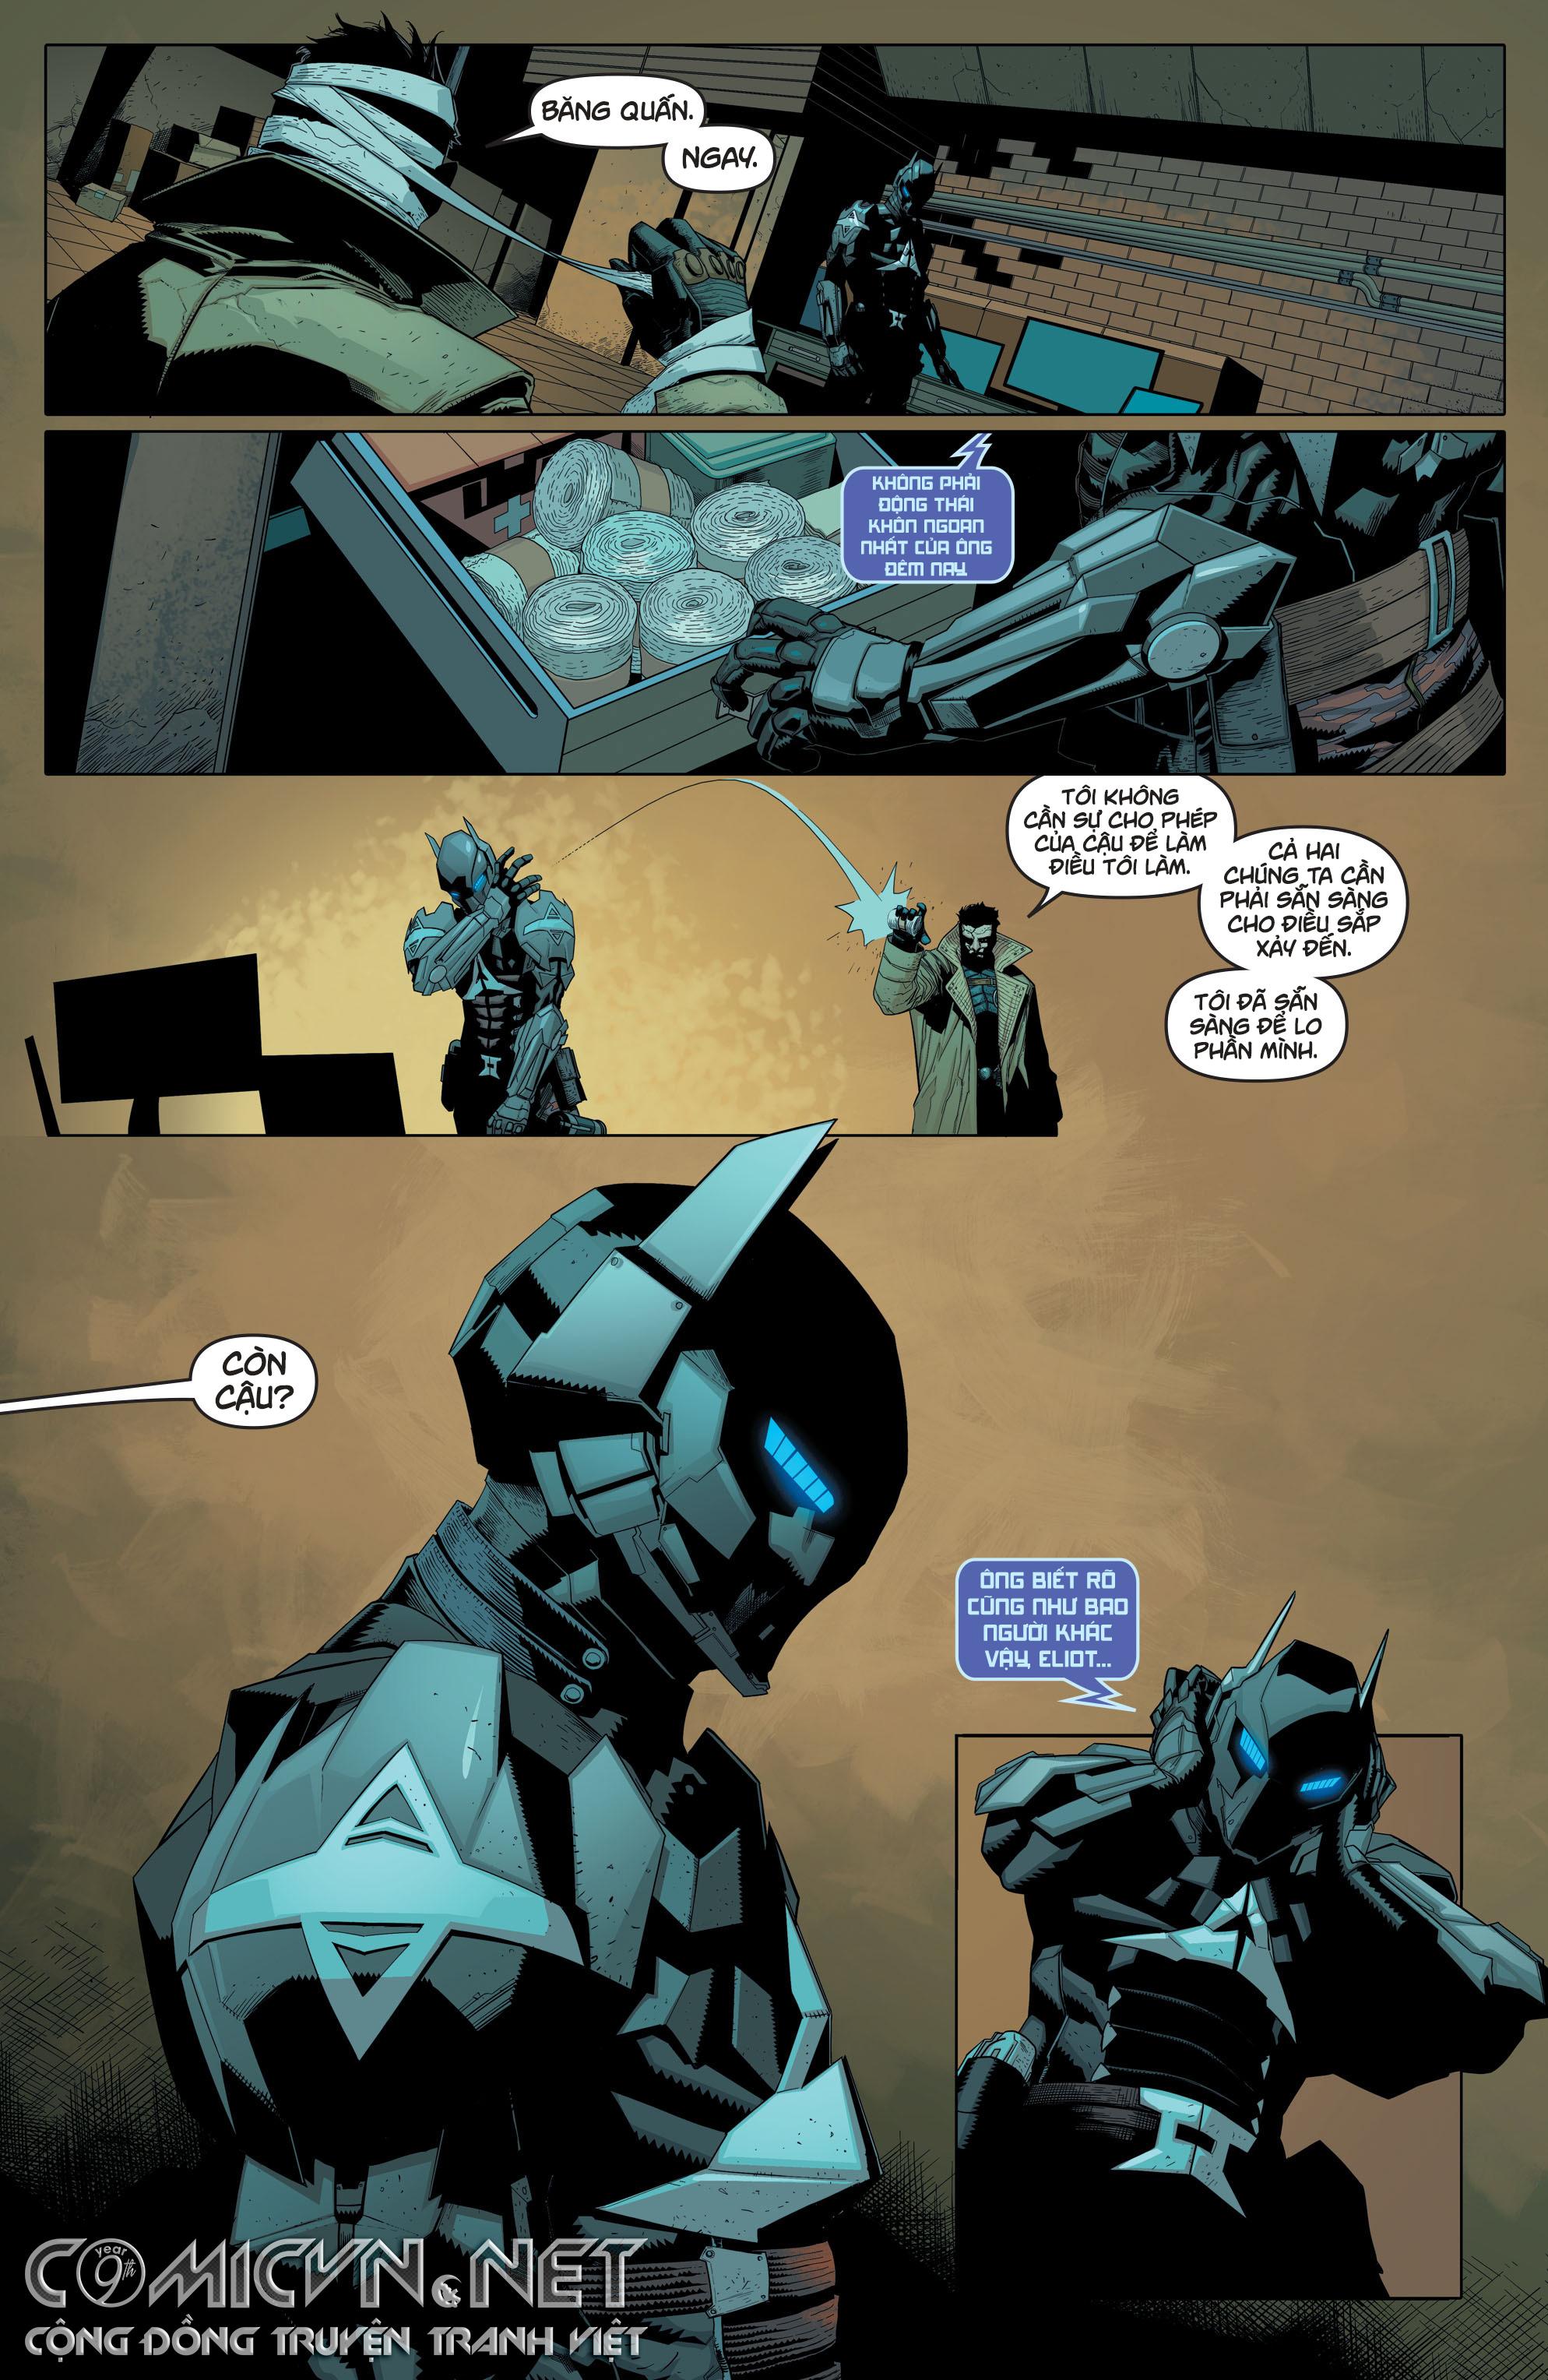 Batman: Arkham Knight - Genesis | Hiệp Sĩ Arkham - Khởi Nguyên